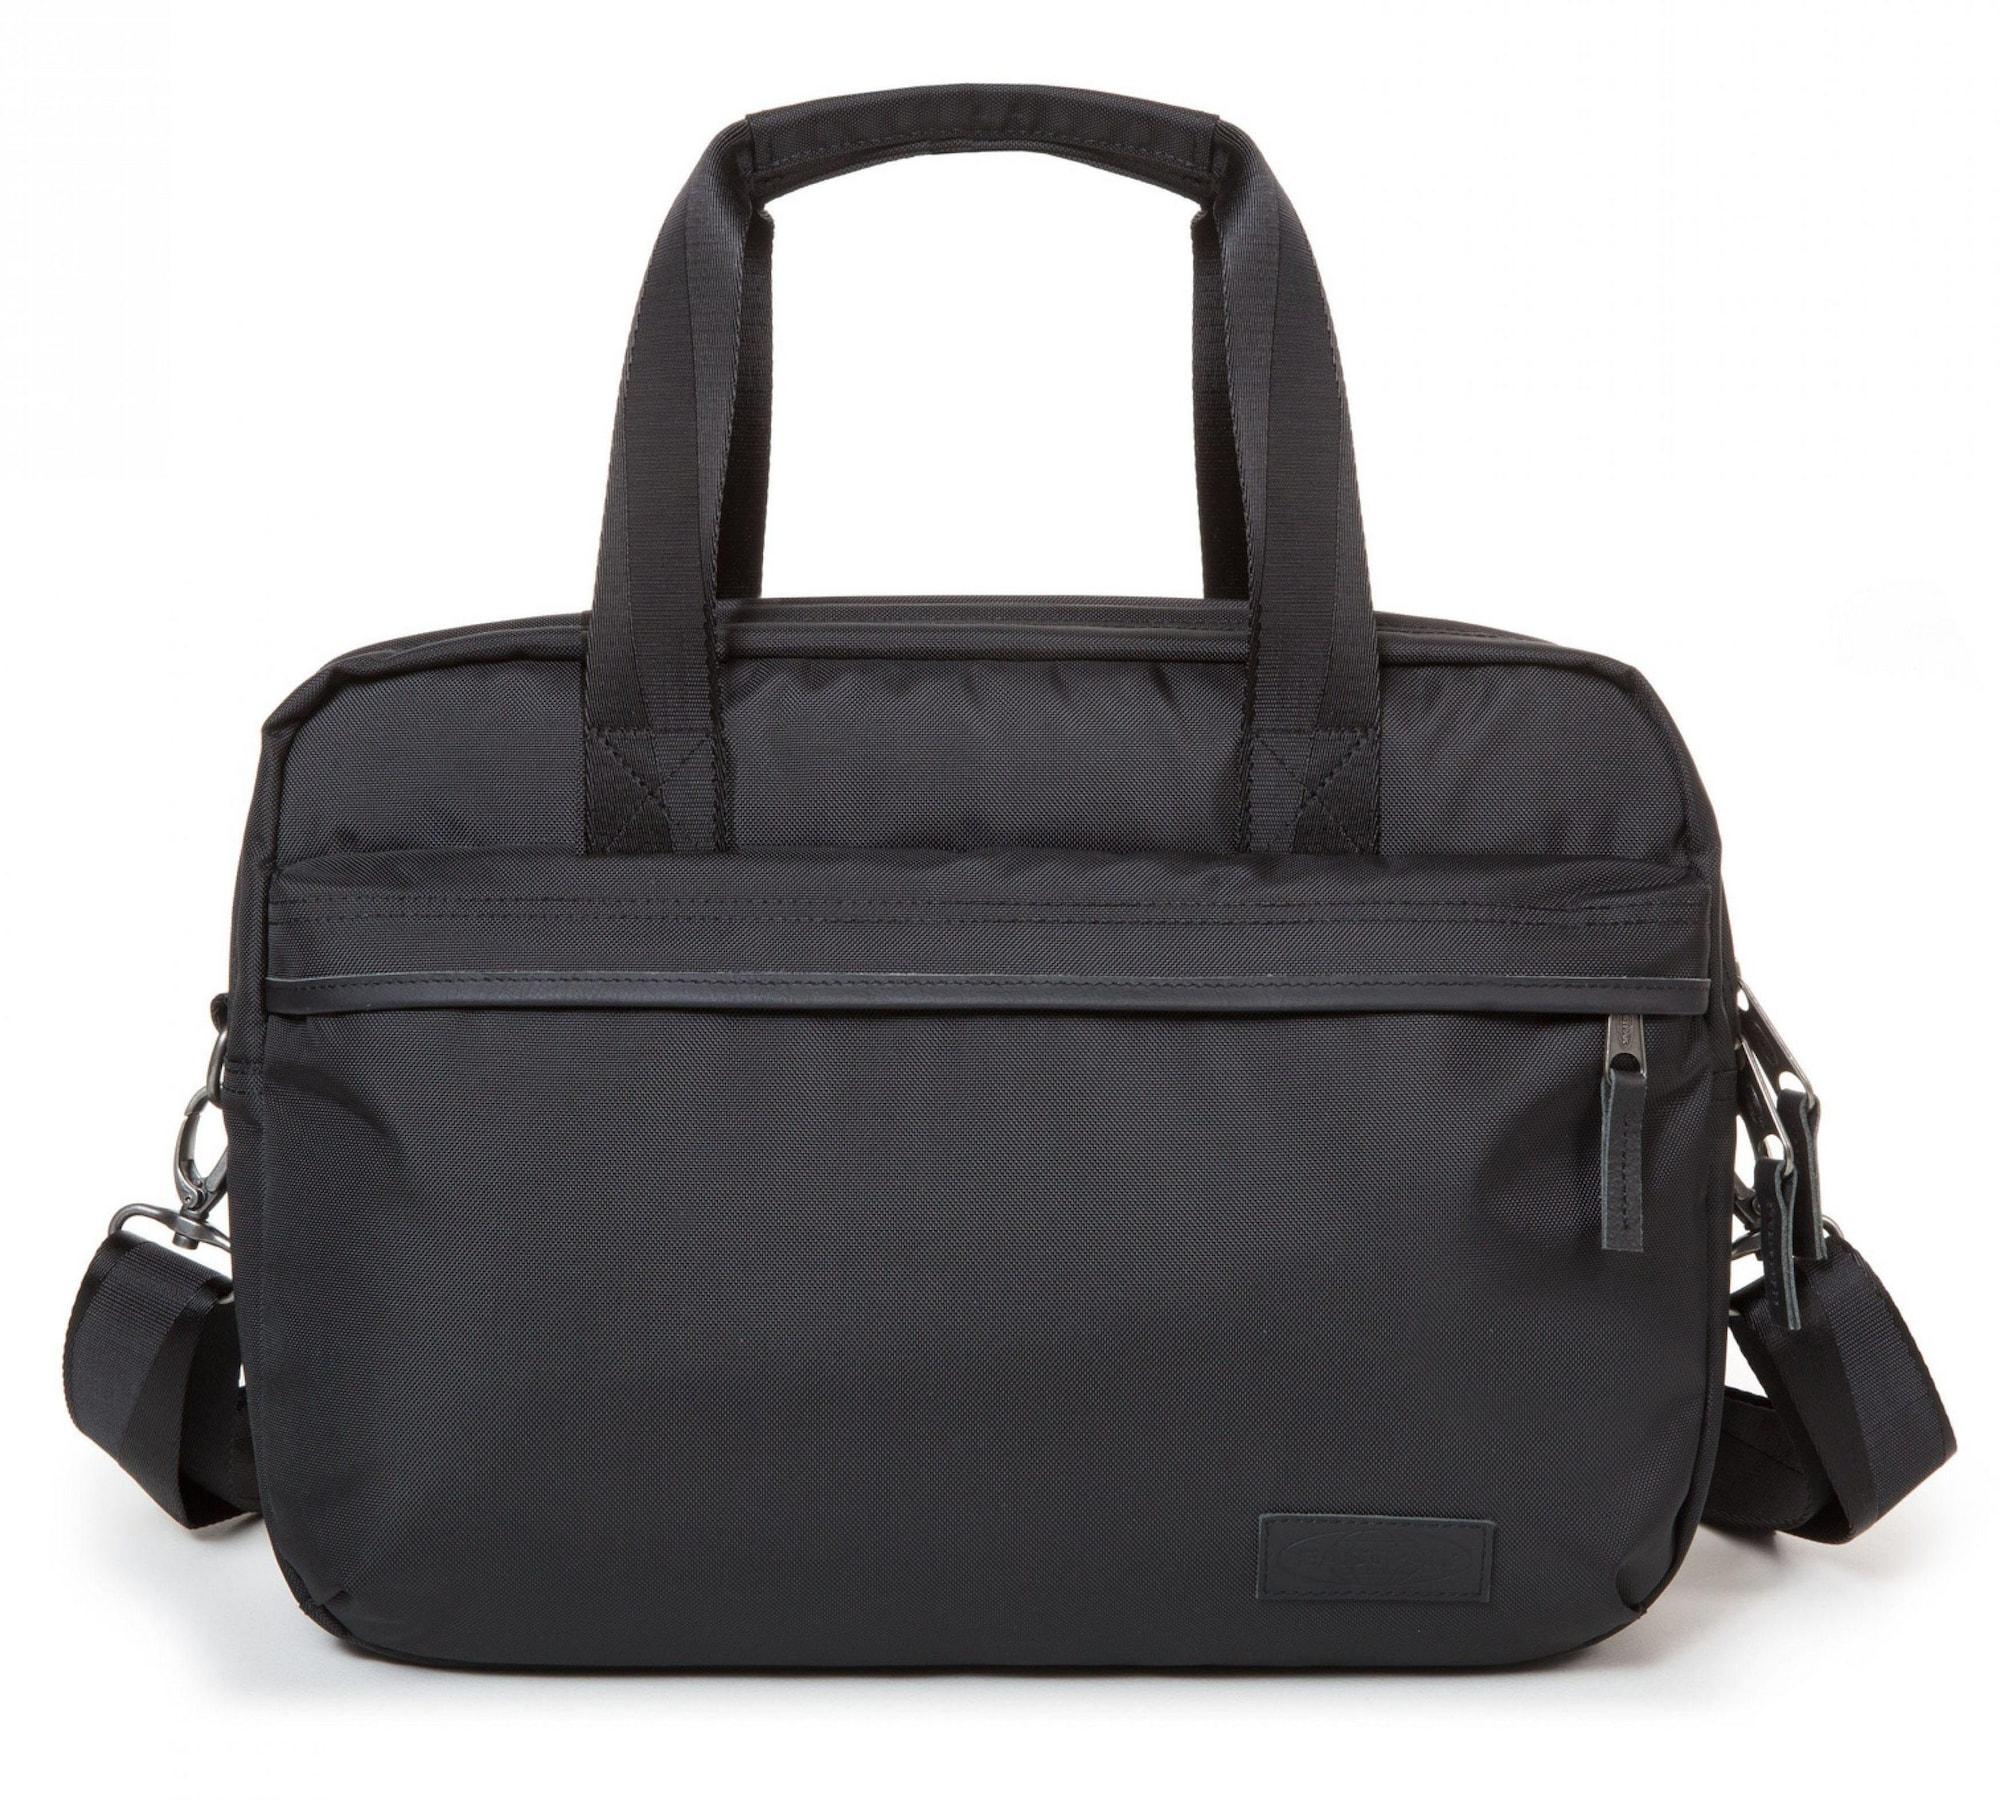 Tasche 'Bartech' | Taschen > Umhängetaschen | Eastpak